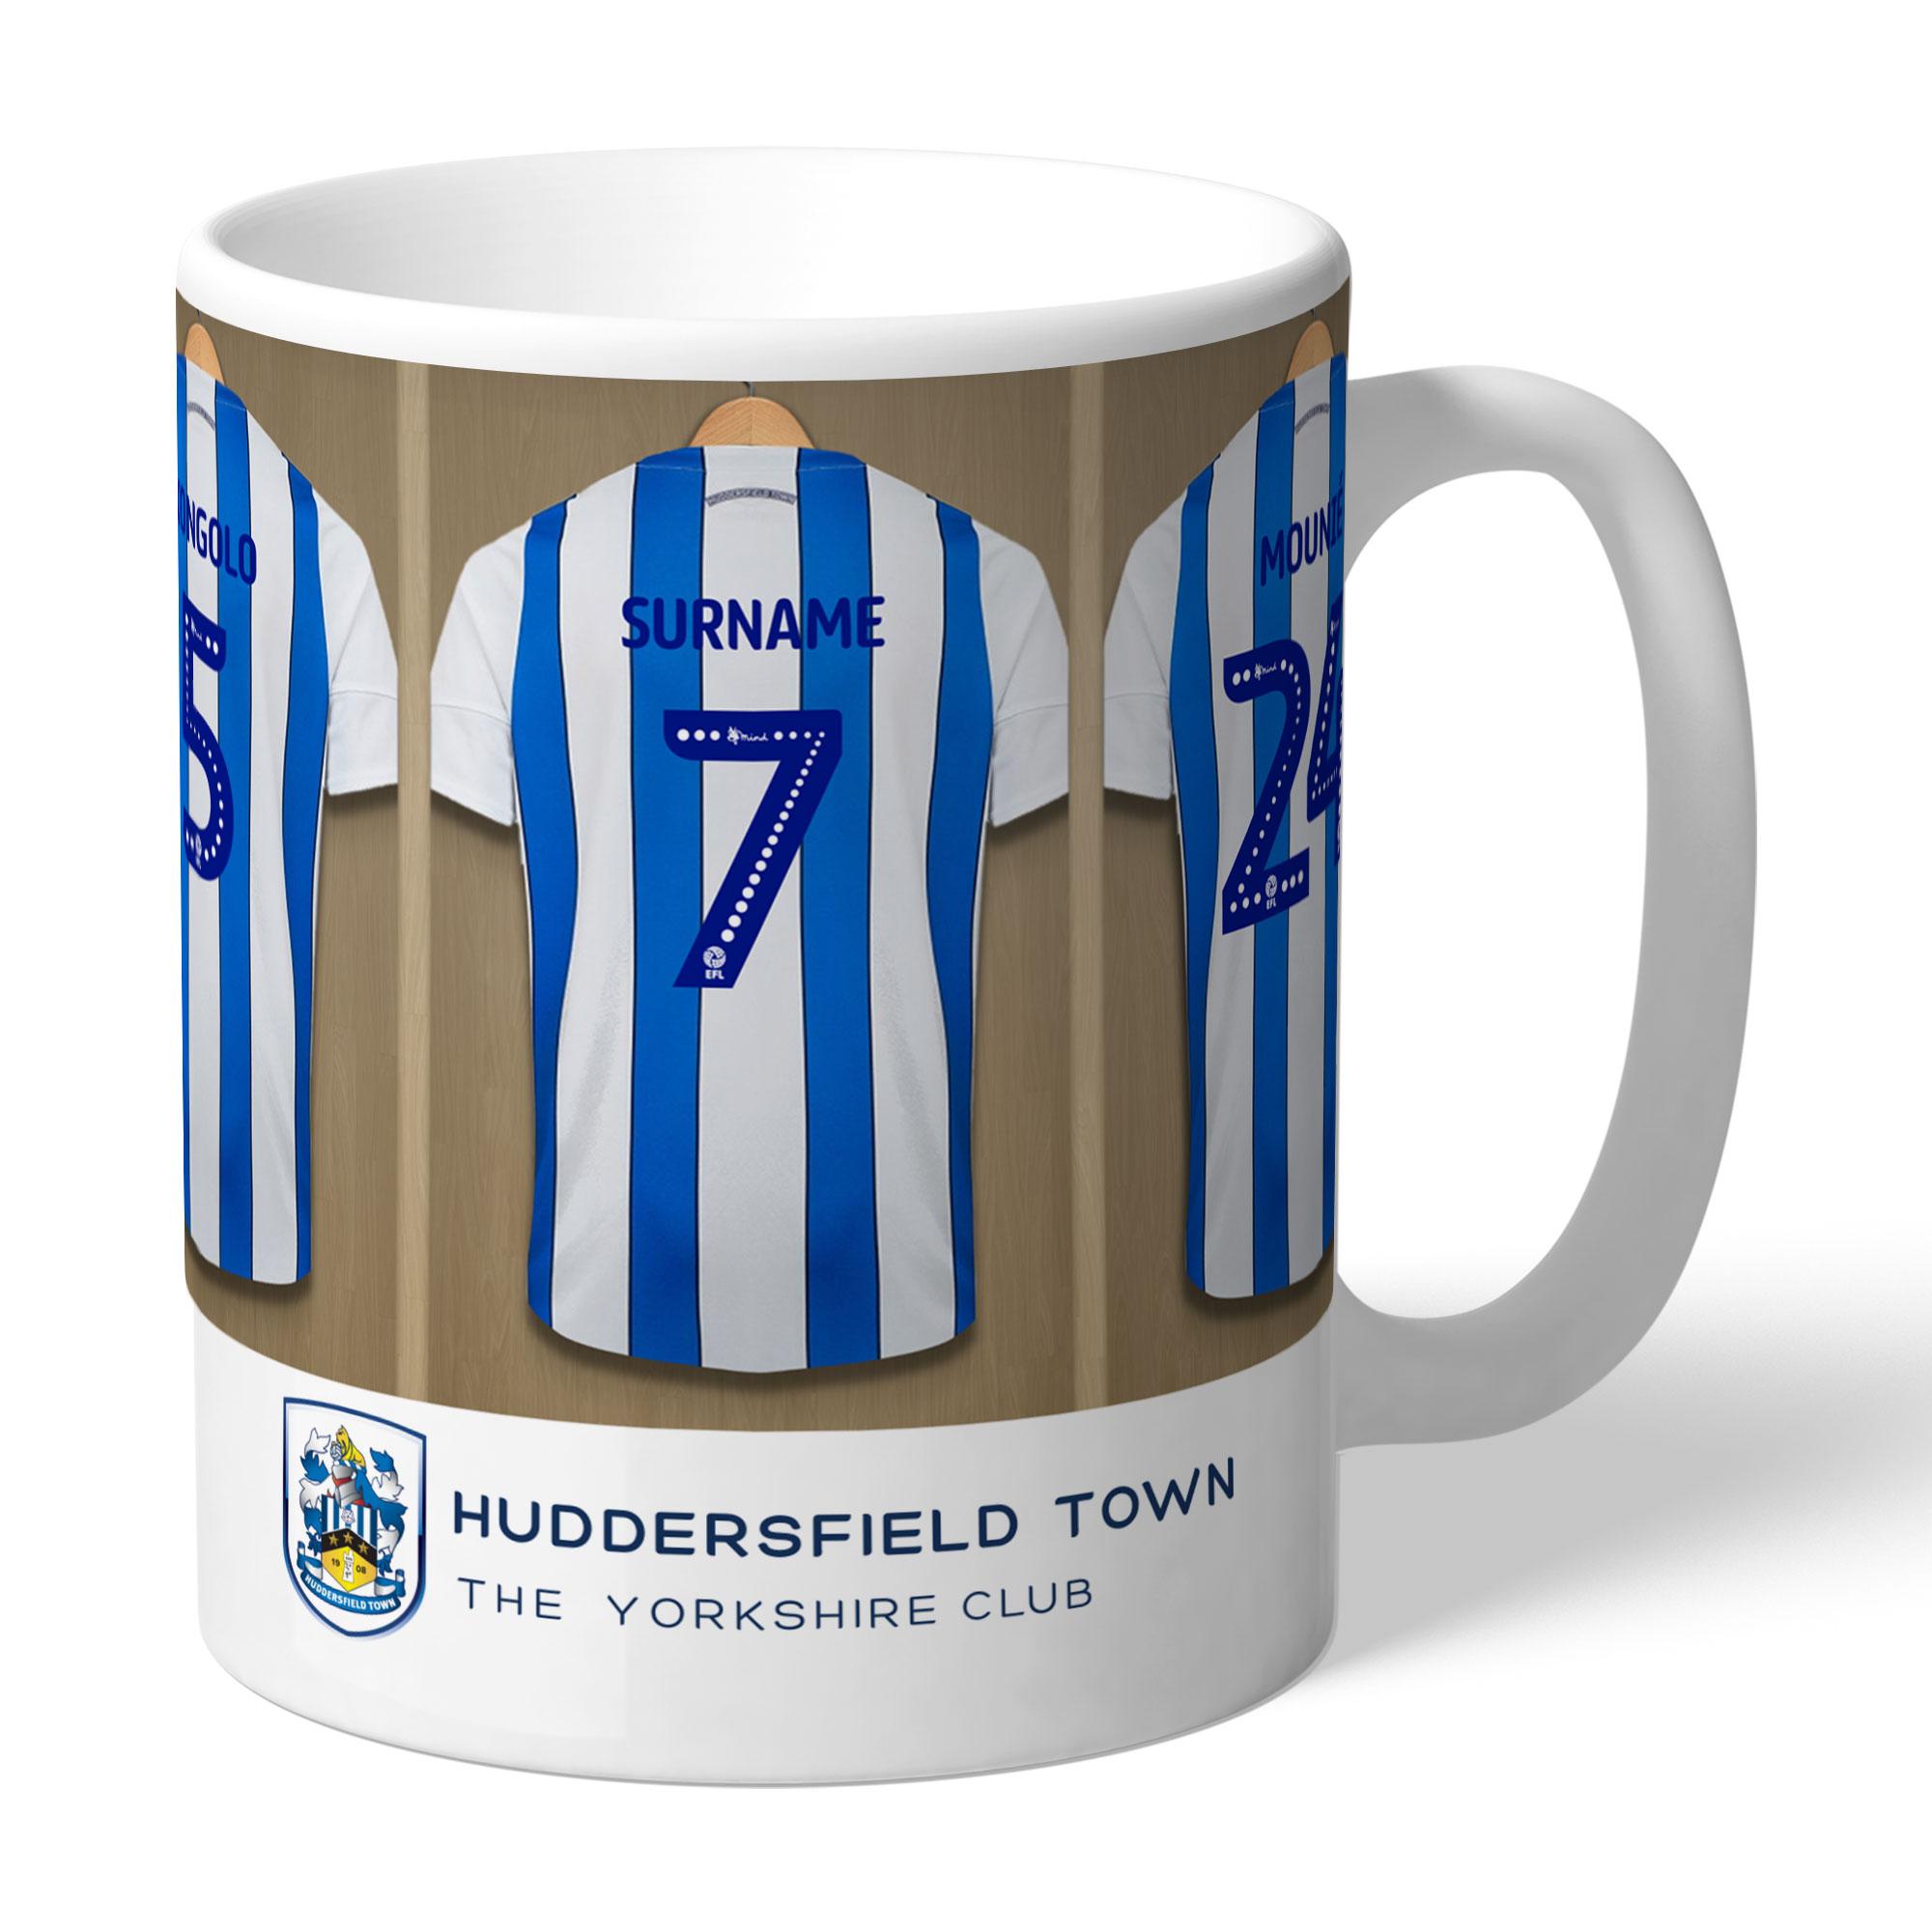 Huddersfield Town AFC Dressing Room Mug